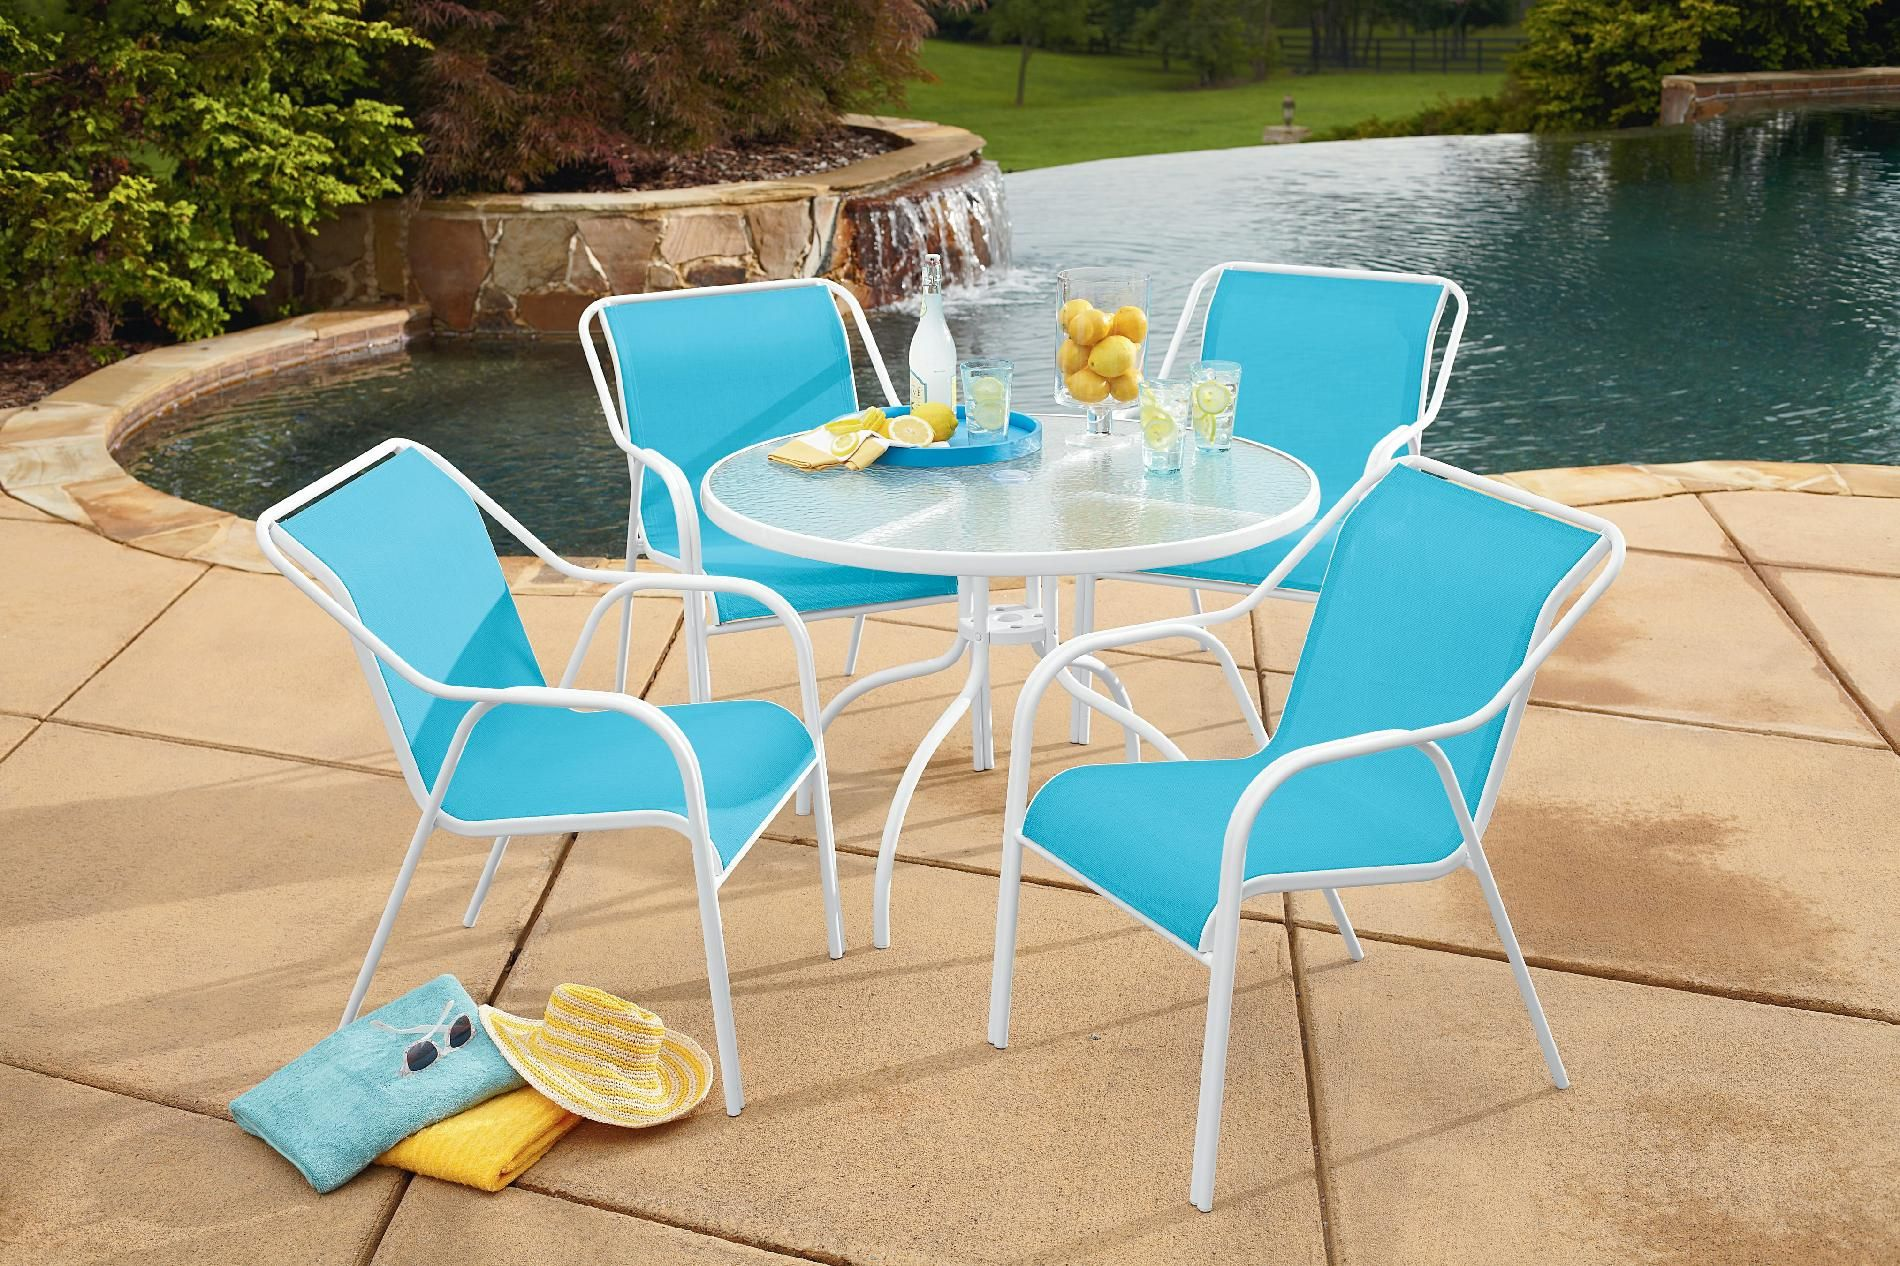 Excellent Garden Oasis Hamlin Steel 5 Piece Sling Patio Set Machost Co Dining Chair Design Ideas Machostcouk